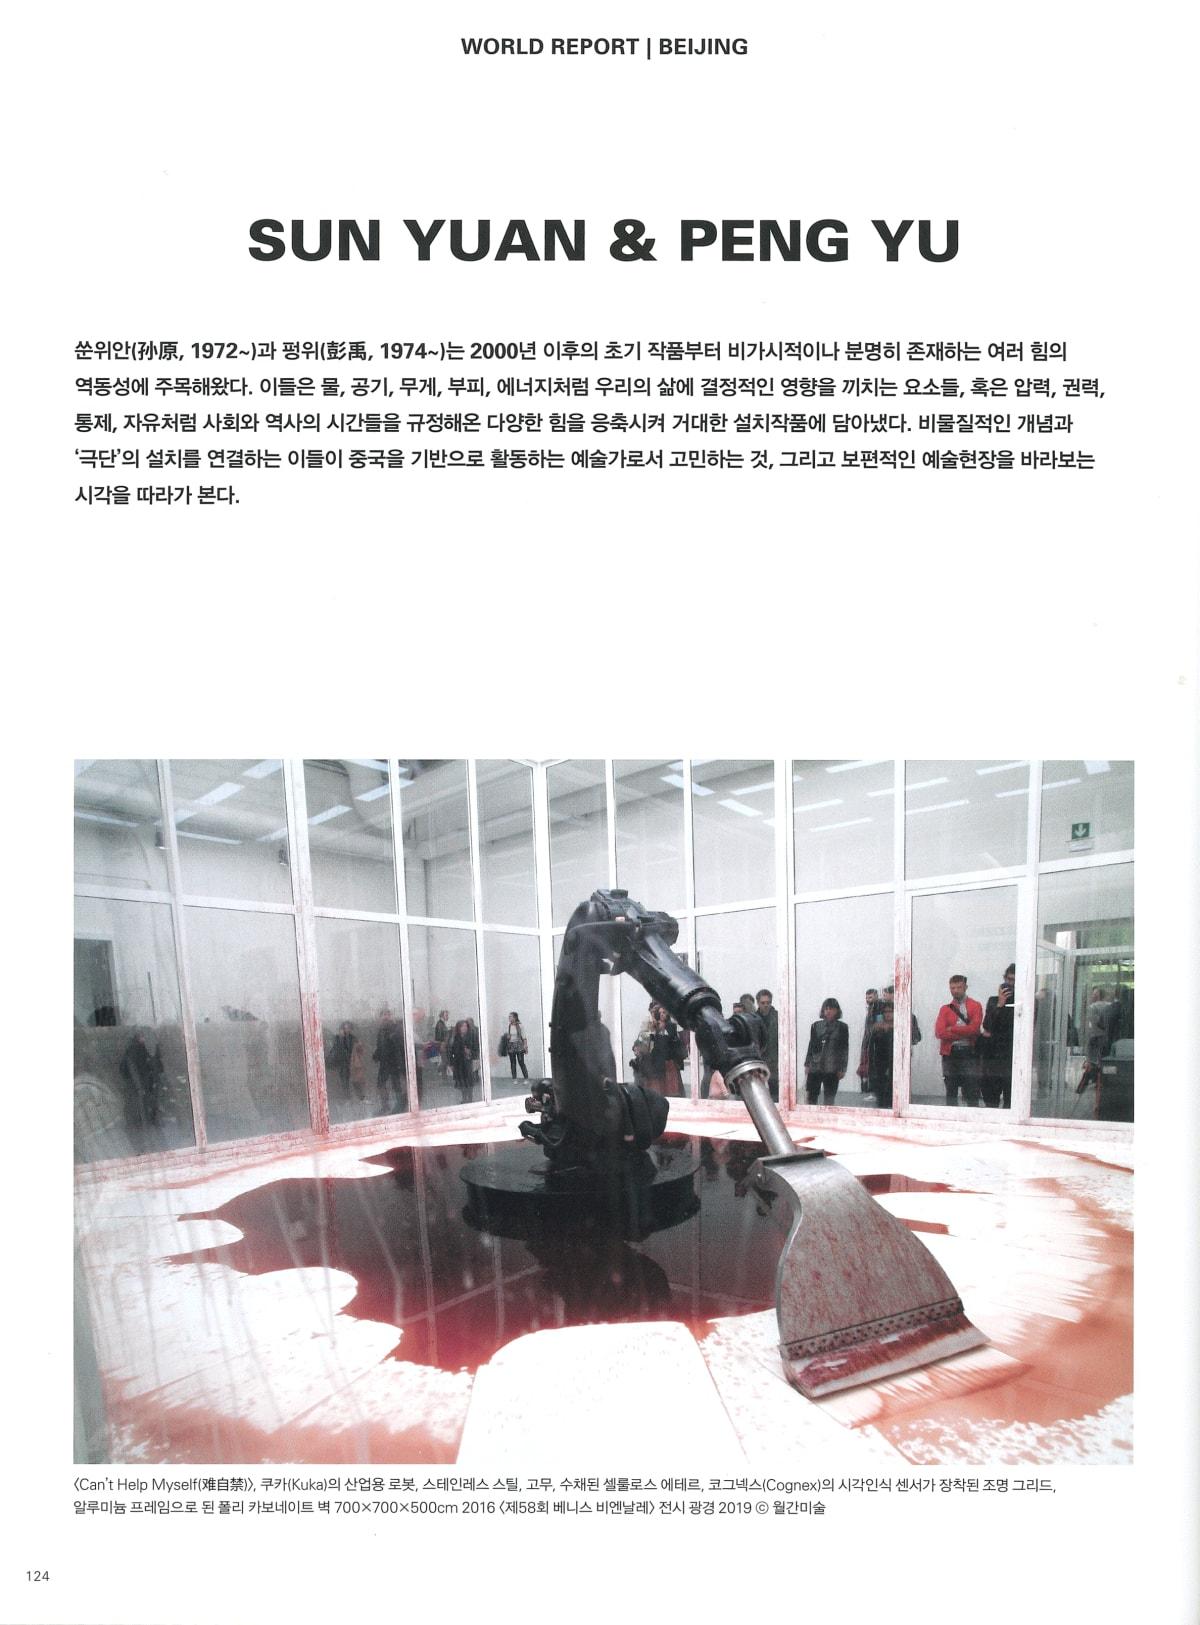 Monthly Art: Sun Yuan & Peng Yu